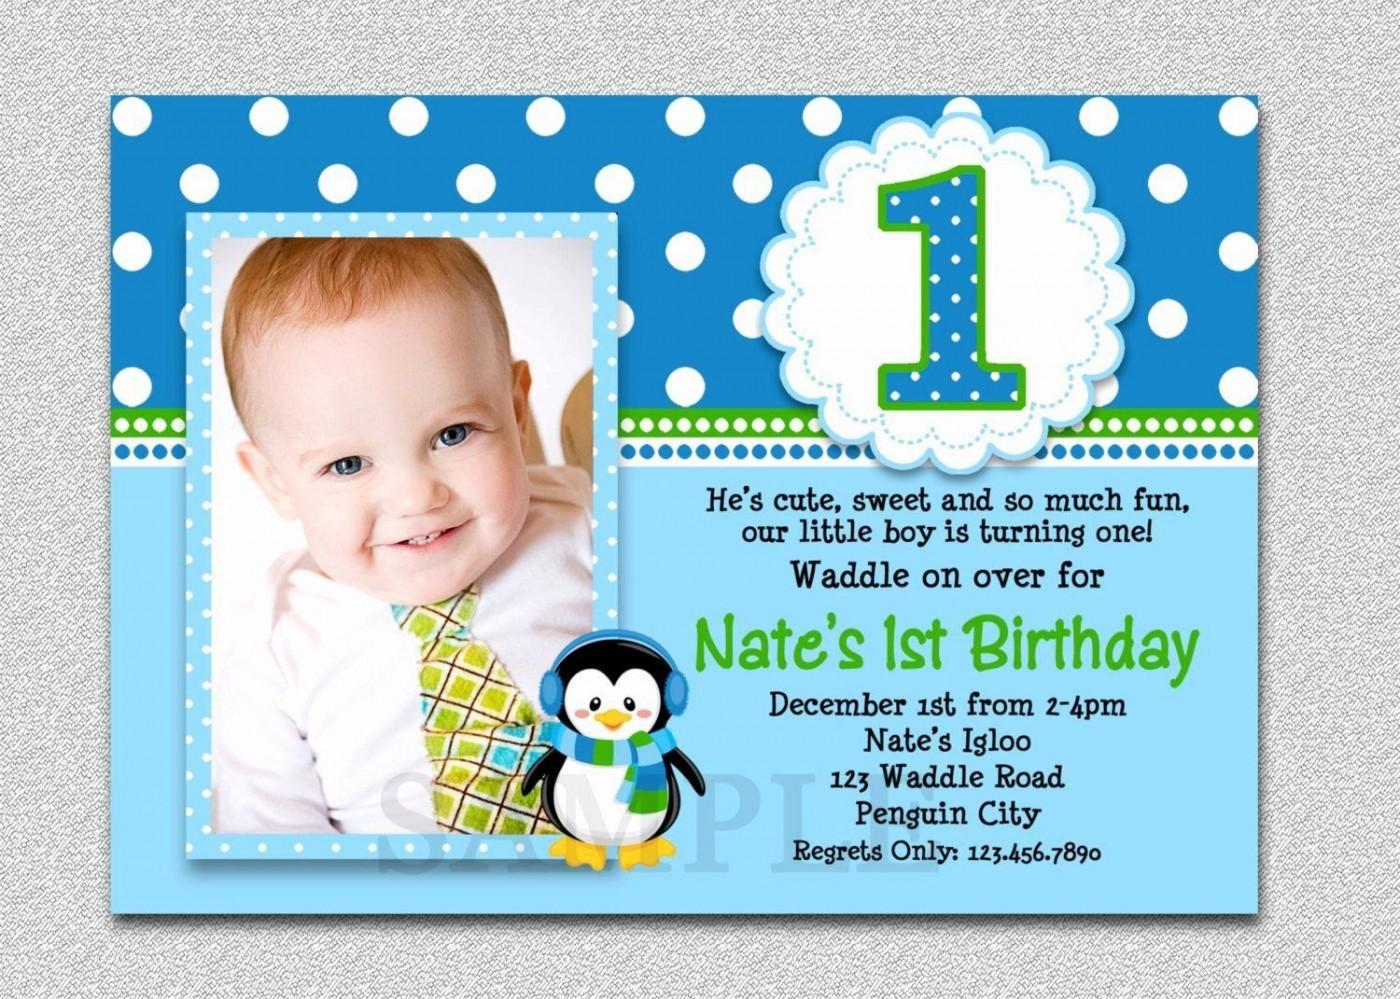 009 Dreaded Free Online 1st Birthday Invitation Card Maker For Twin Idea 1400